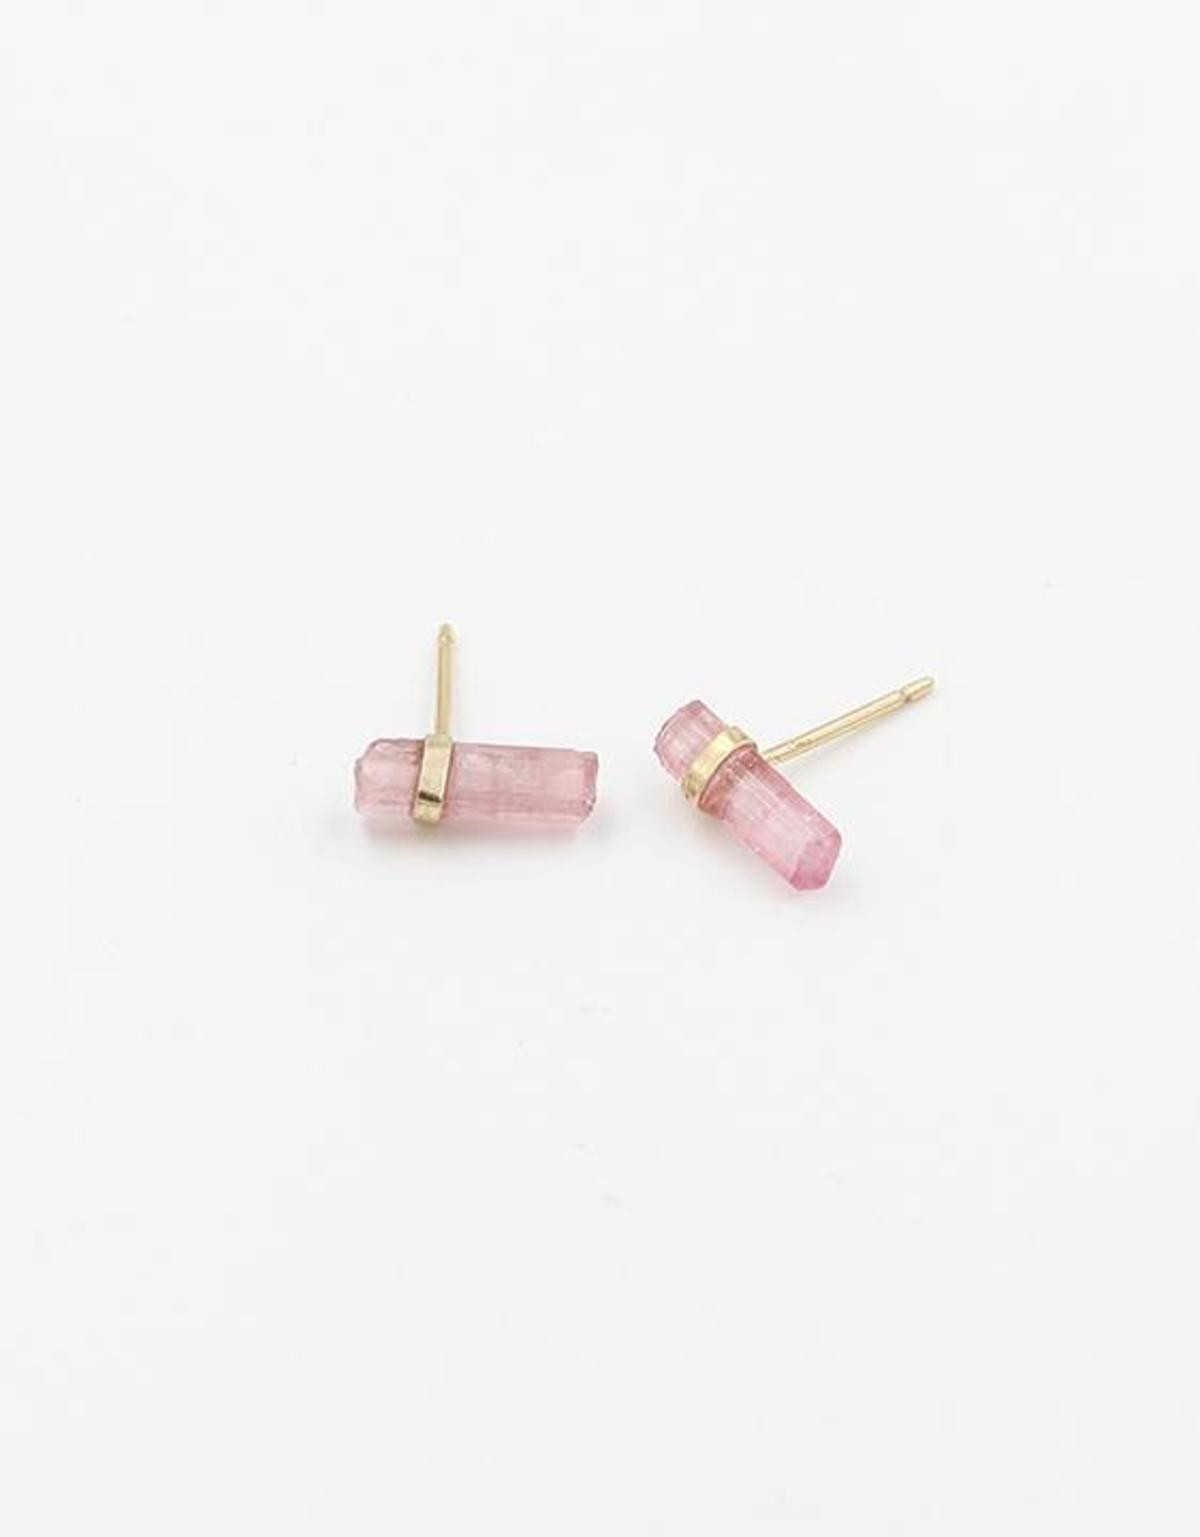 Sweetly precious Tourmaline Crystal Jené Despain Pink Nova Studs handmade in NYC, $90 @garmentory.com